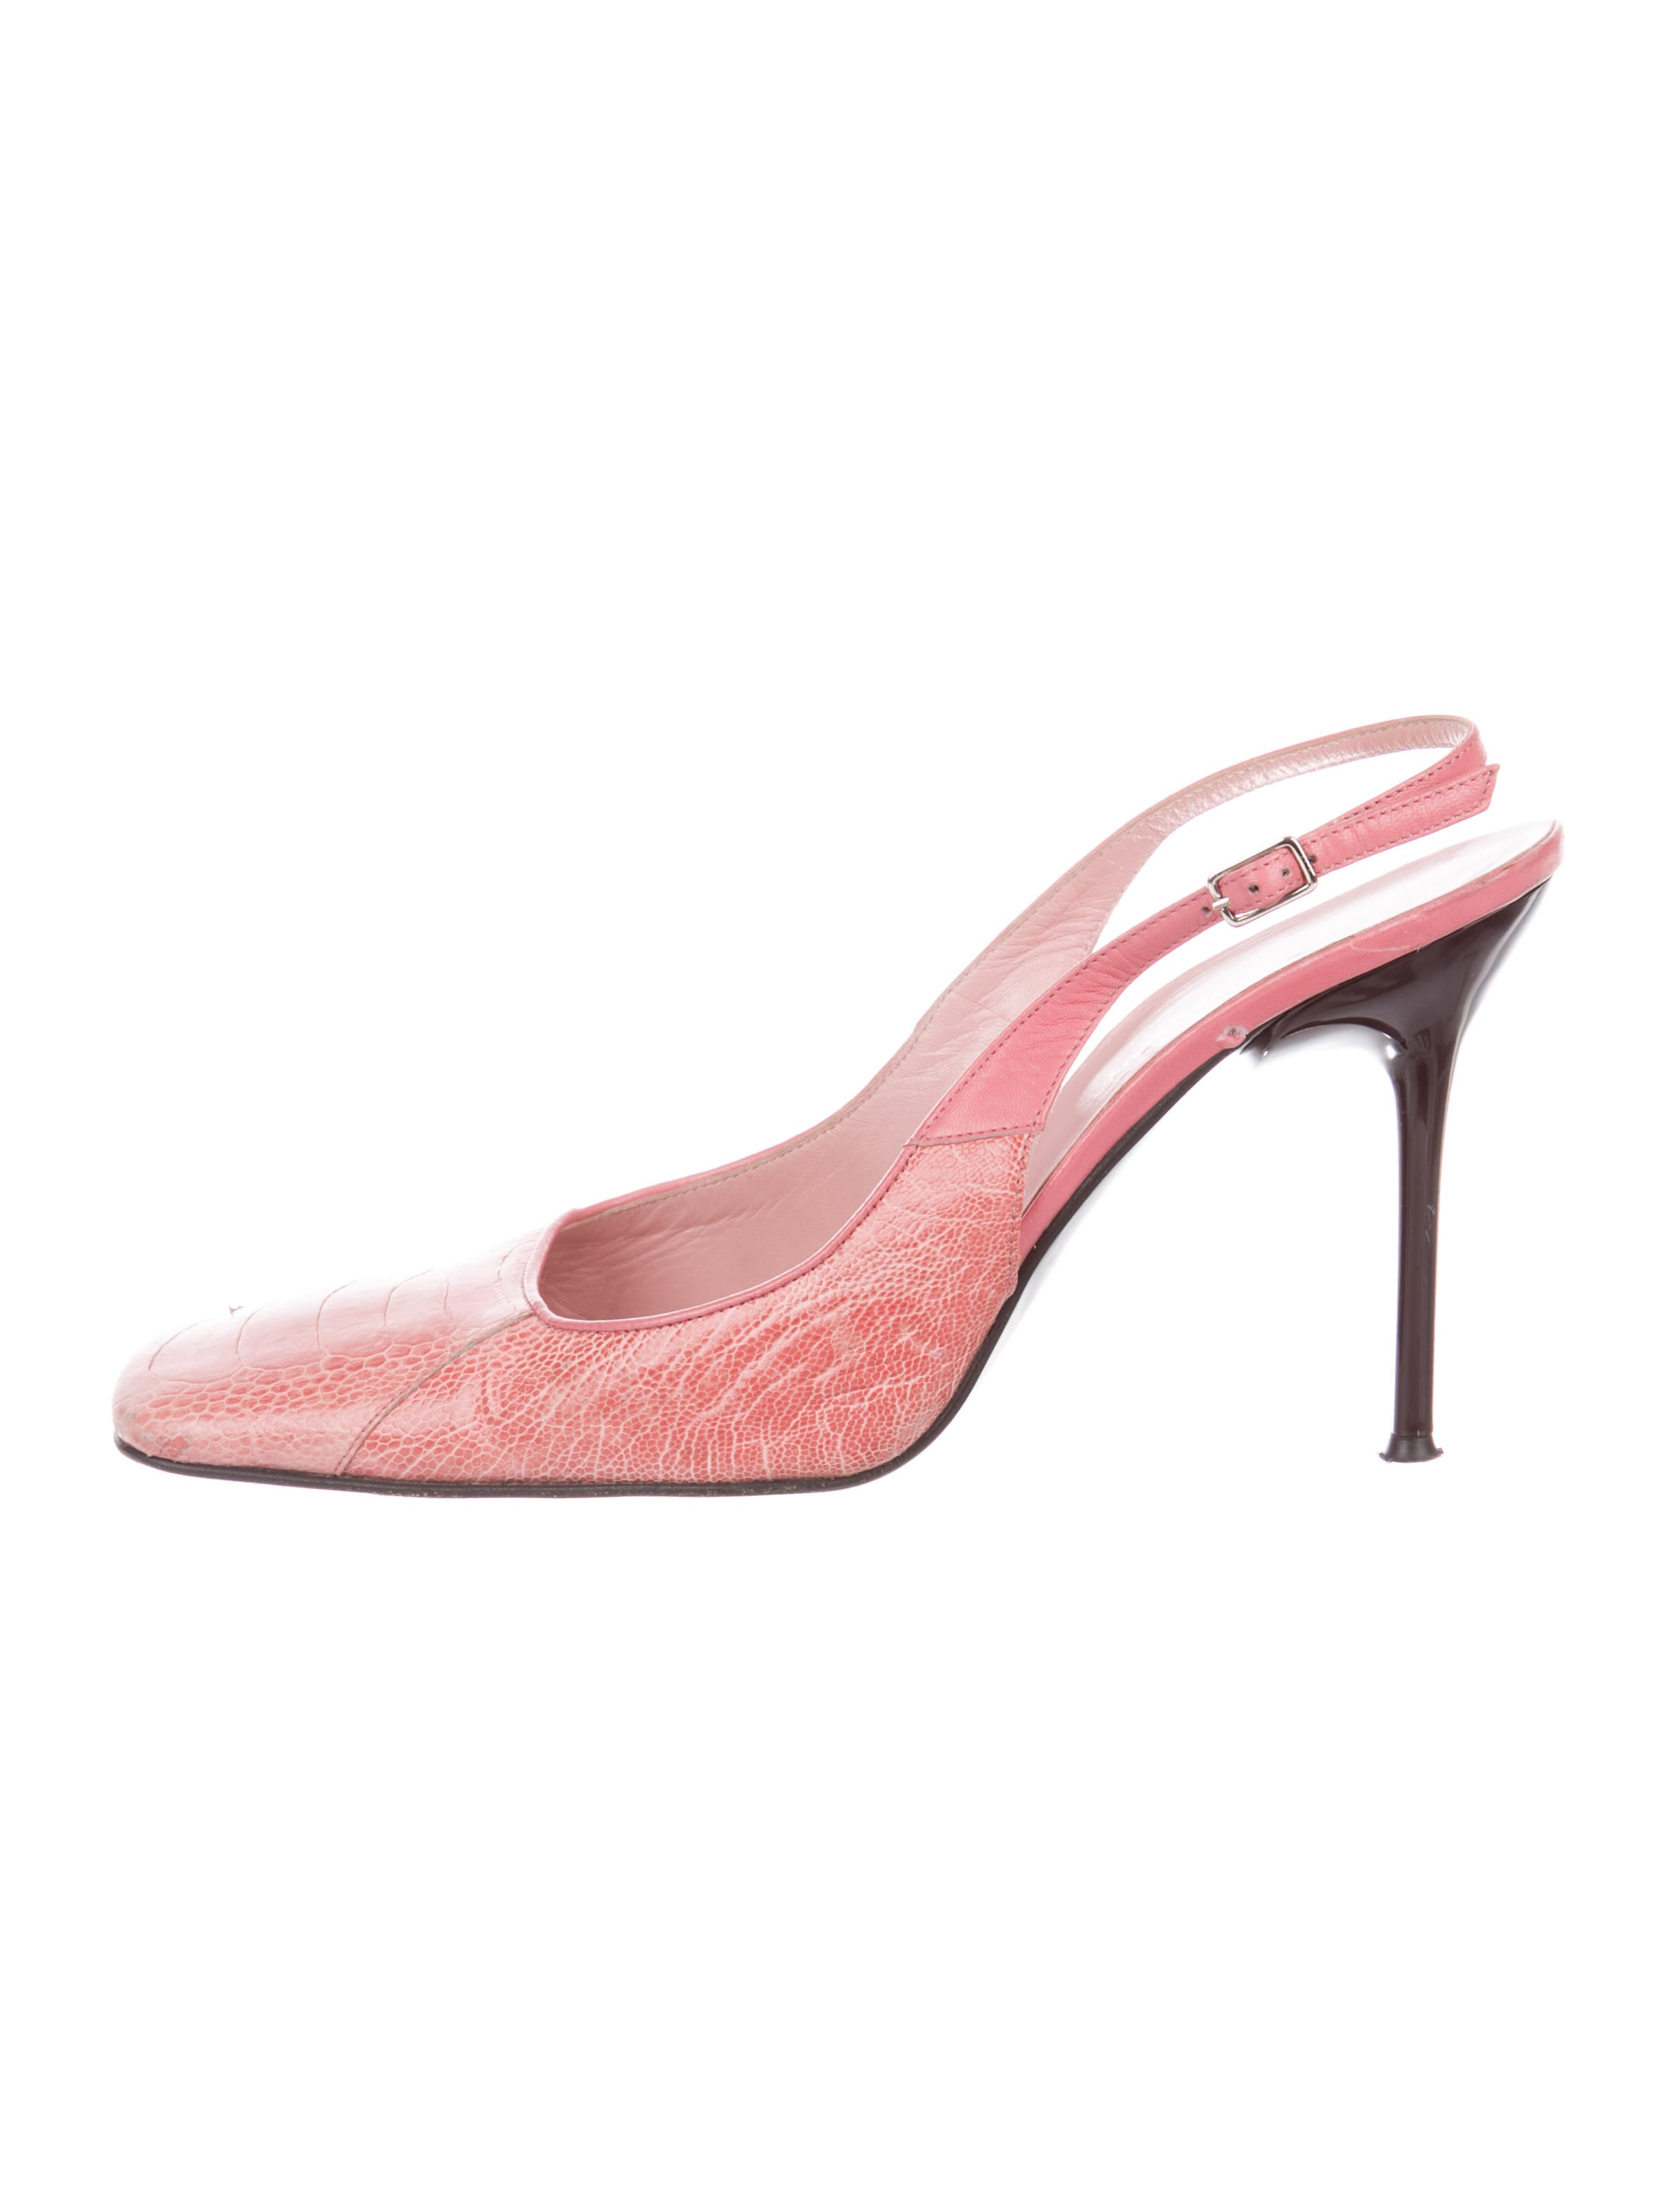 Dolce & Gabbana Ostrich Leg Slingback Pumps cheap fast delivery cheap get authentic Su7ebuM